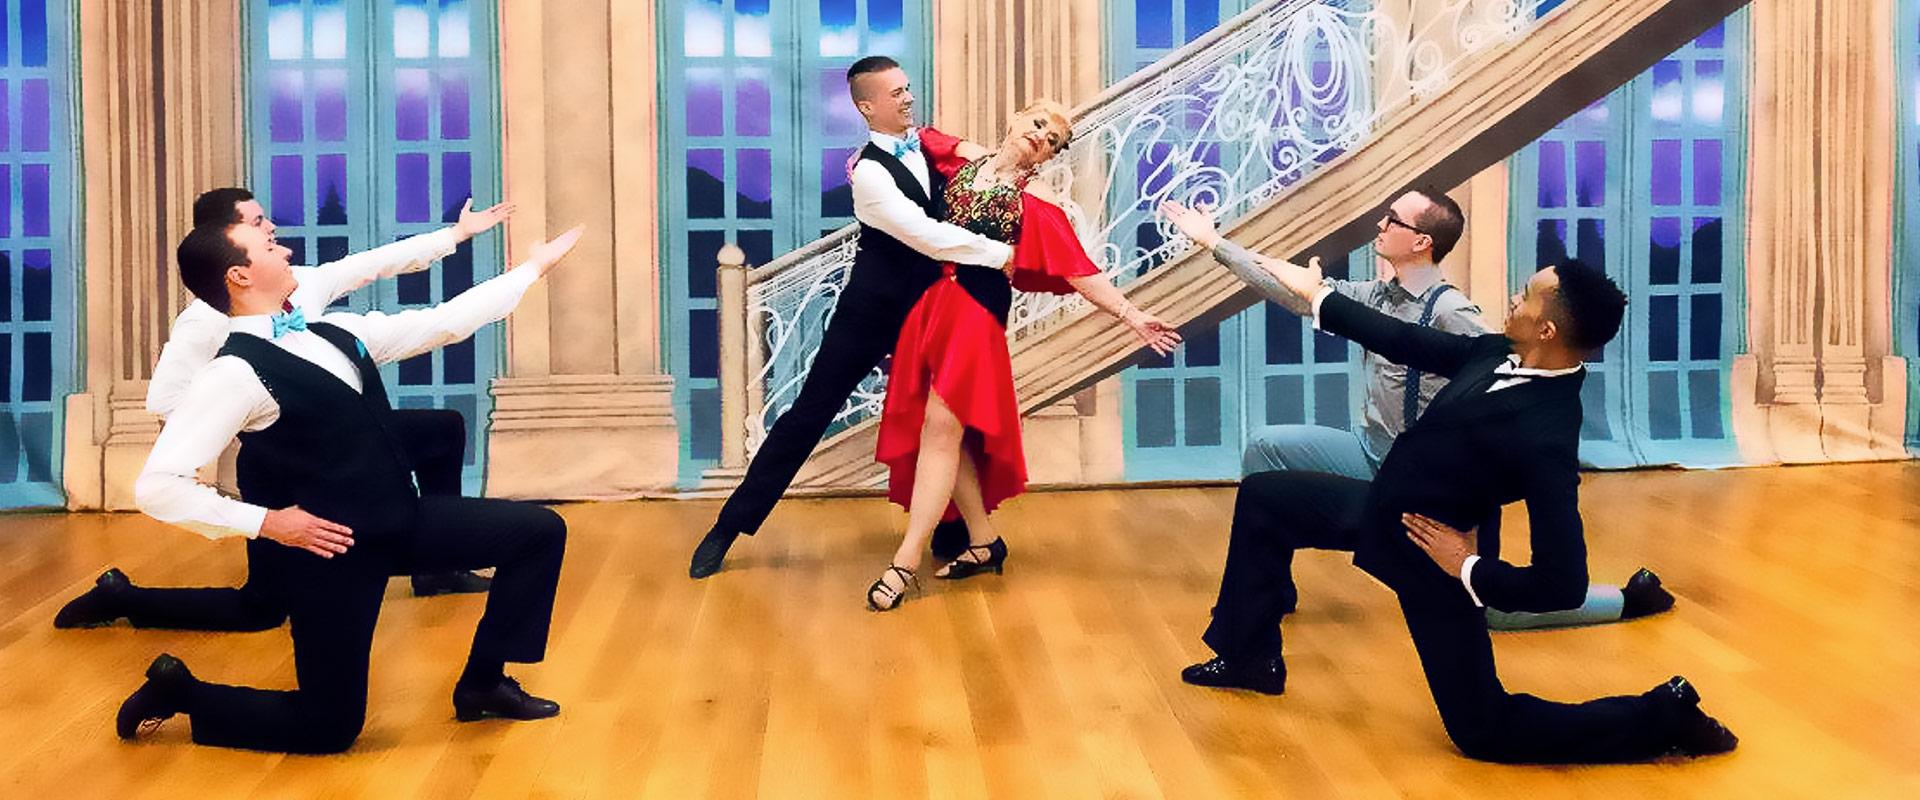 Professional Dance Instructors